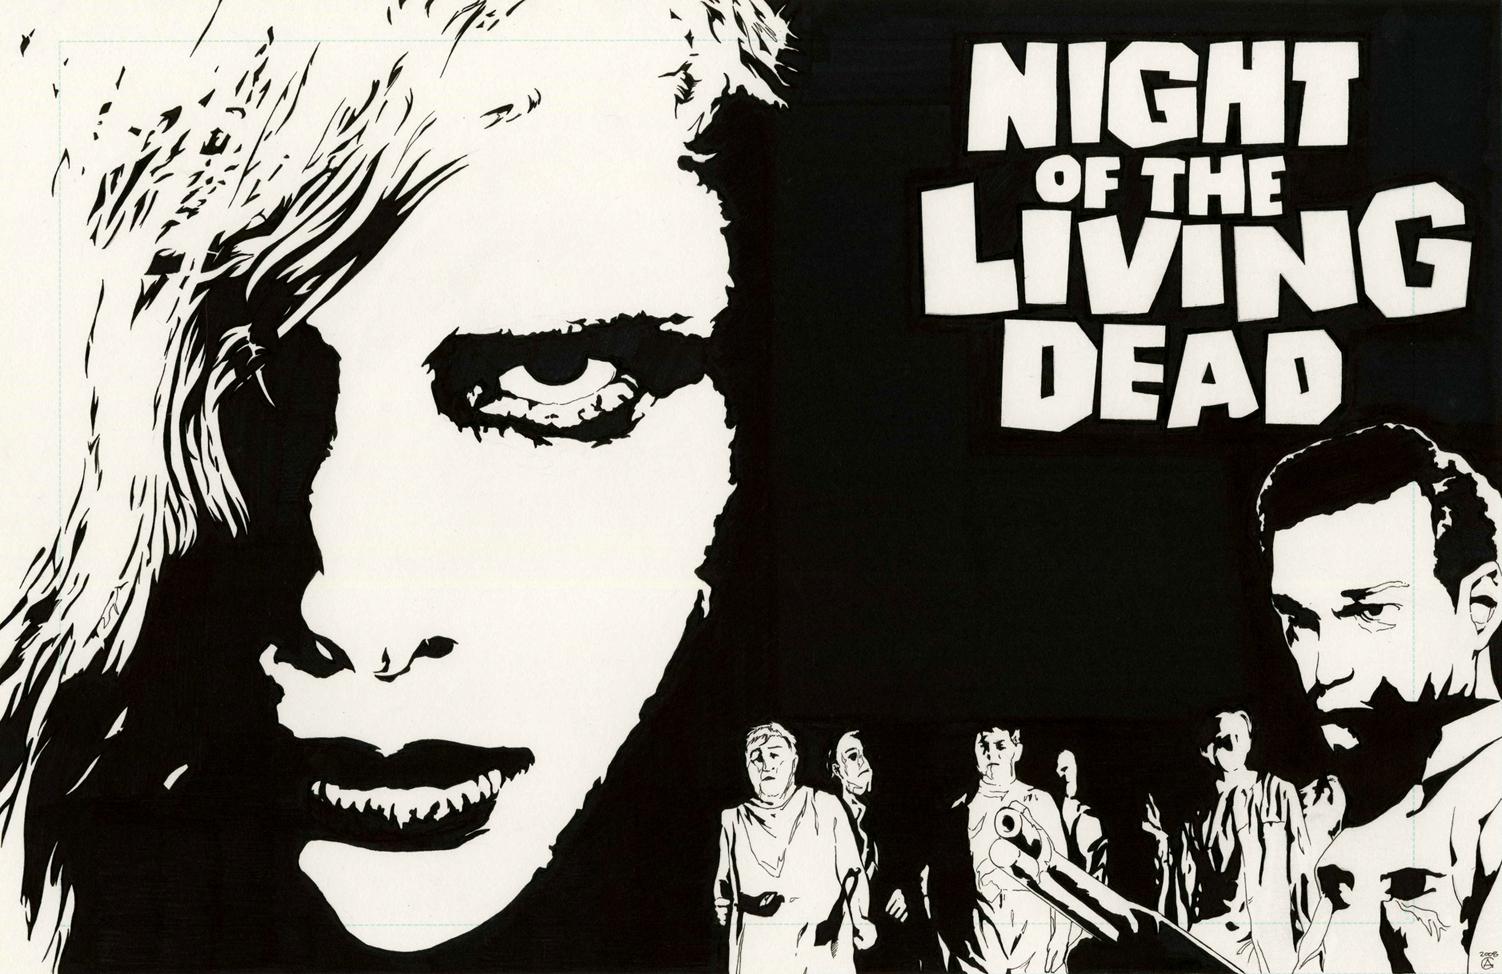 Night Of The Living Dead Fondo De Pantalla And Fondo De